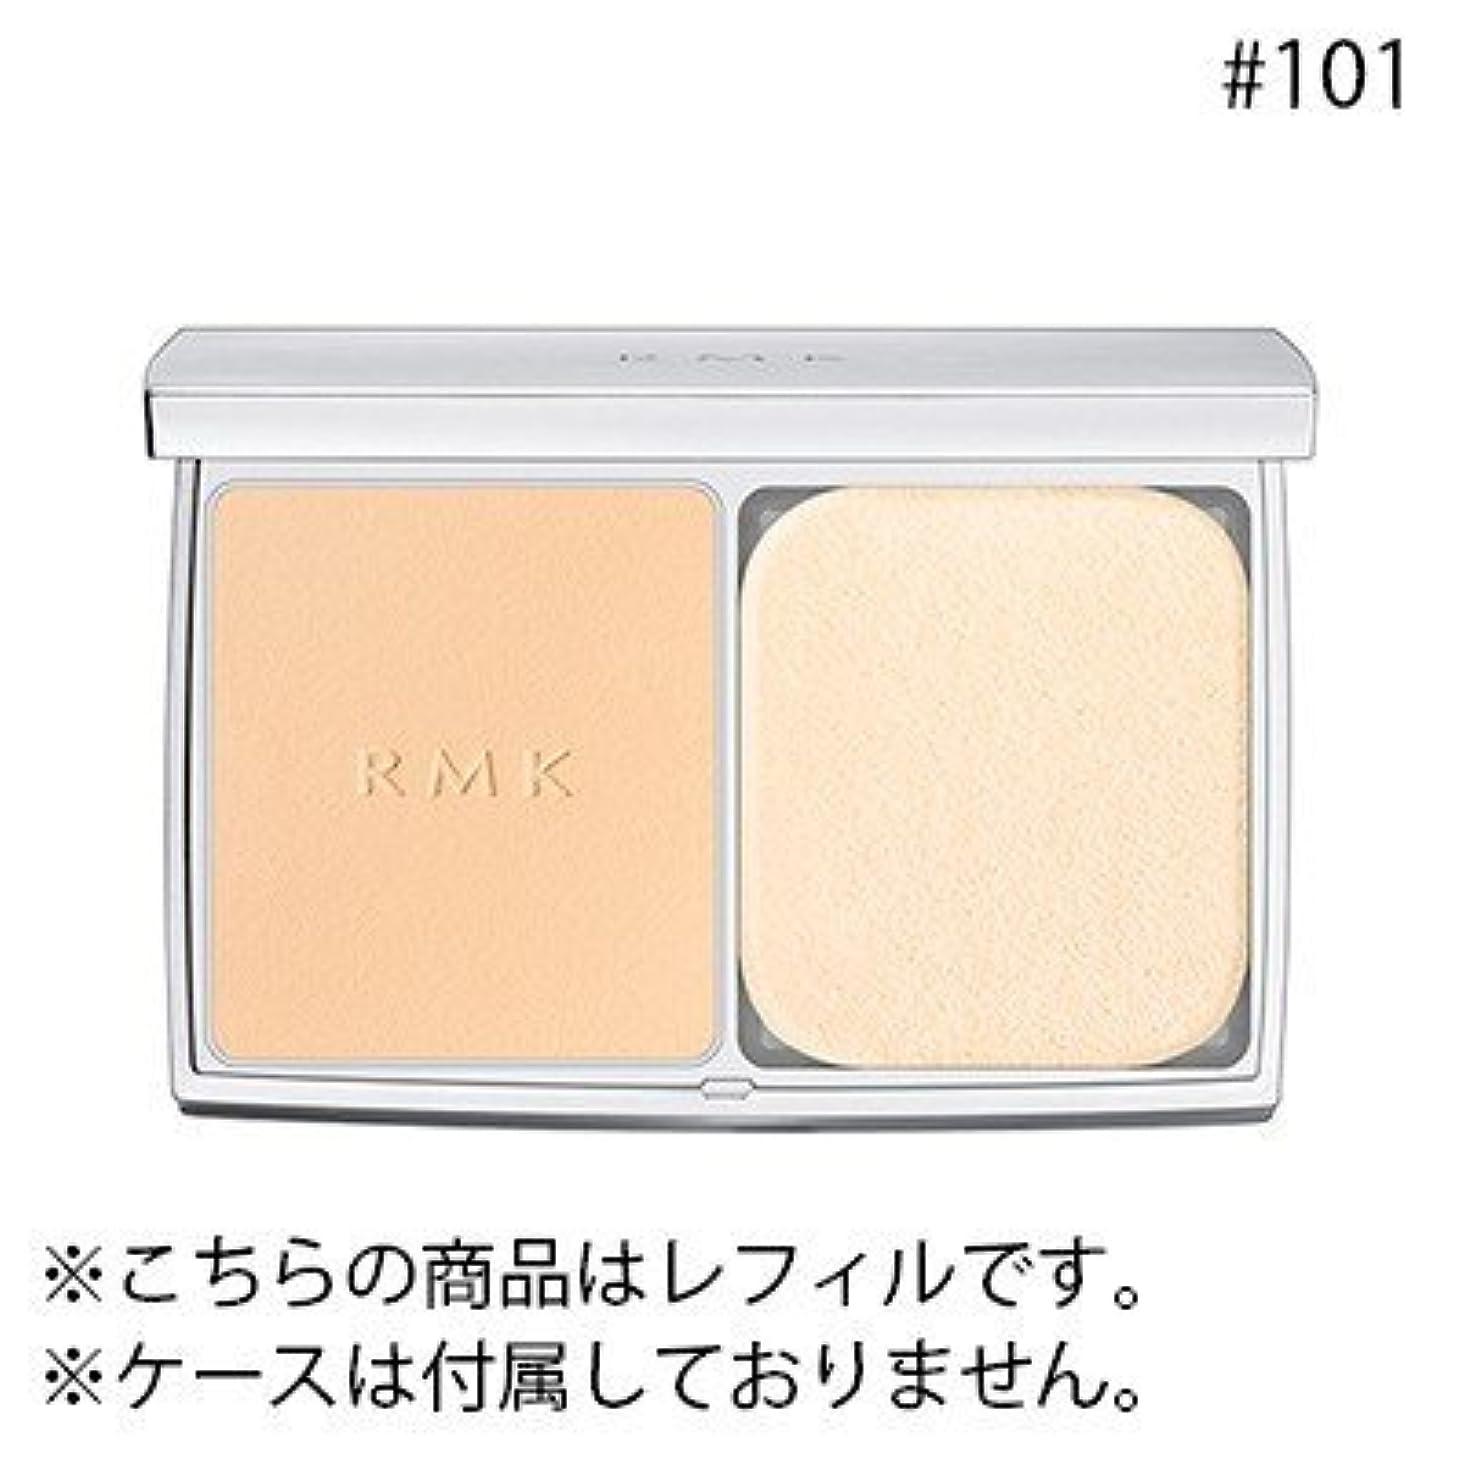 RMK UVパウダー ファンデーション リフィル #101 [並行輸入品]